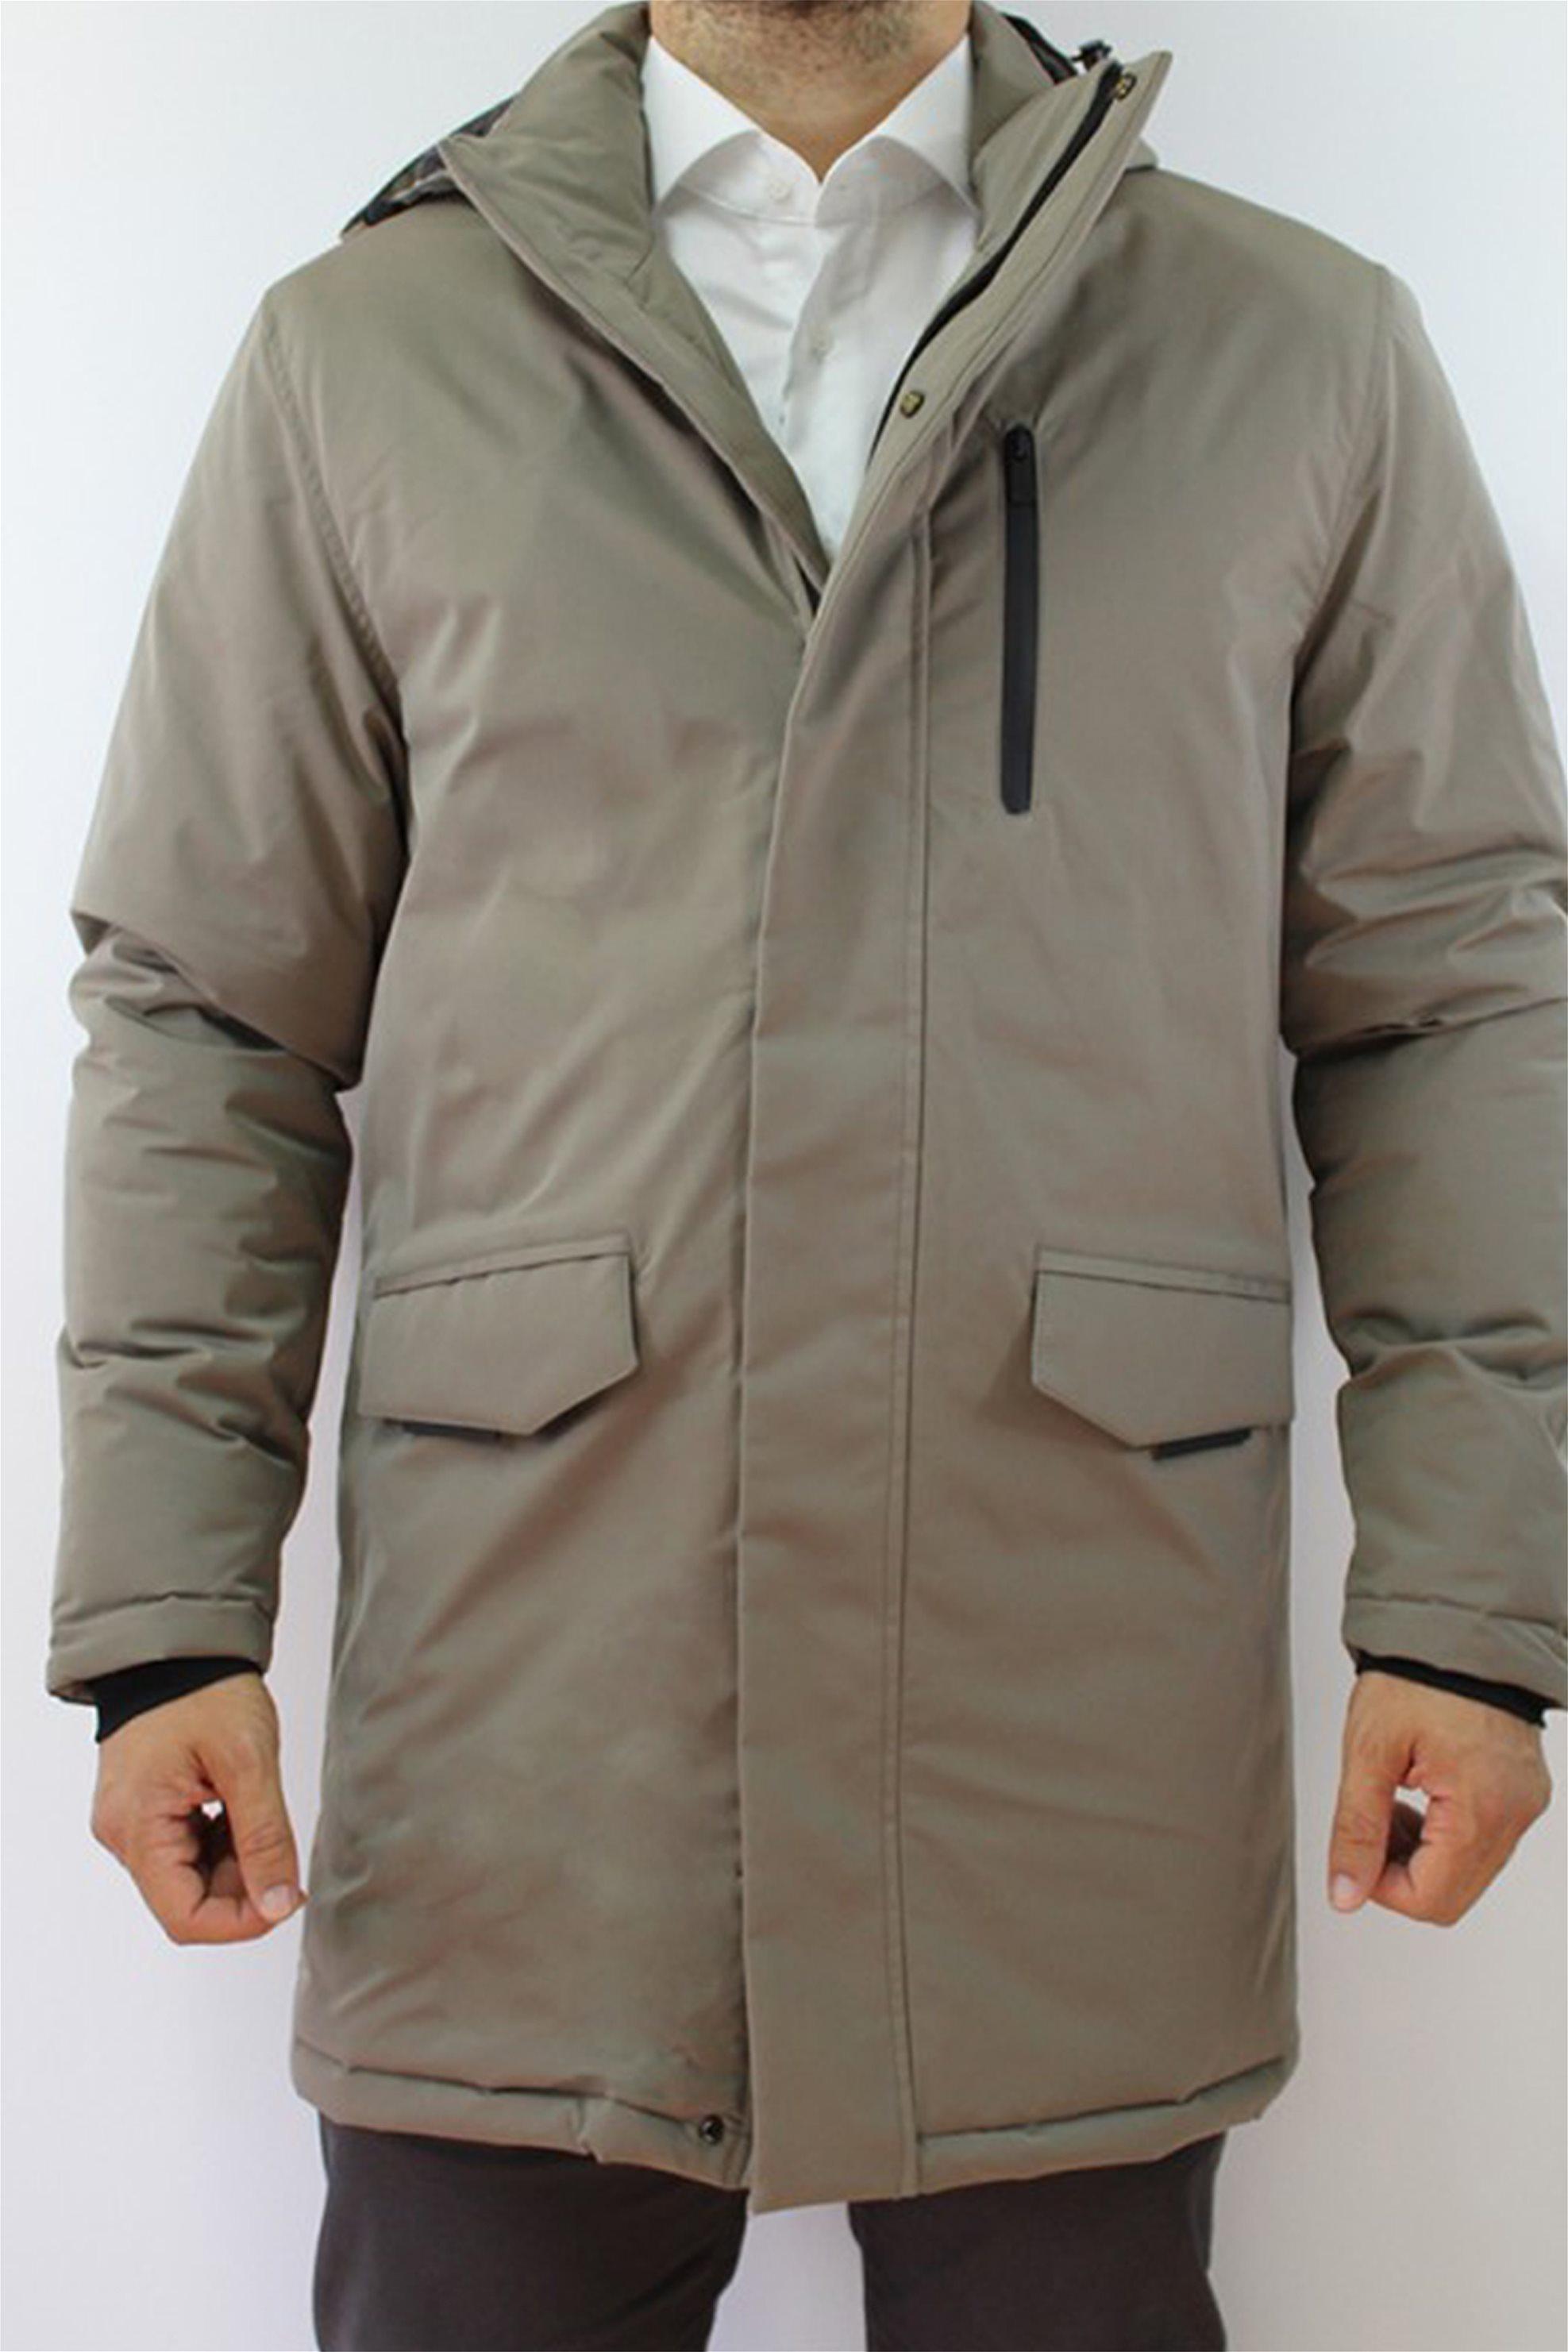 DORS ανδρικό μπουφάν παρκά αδιάβροχο με flap τσέπες - 3029010.C01 - Χακί